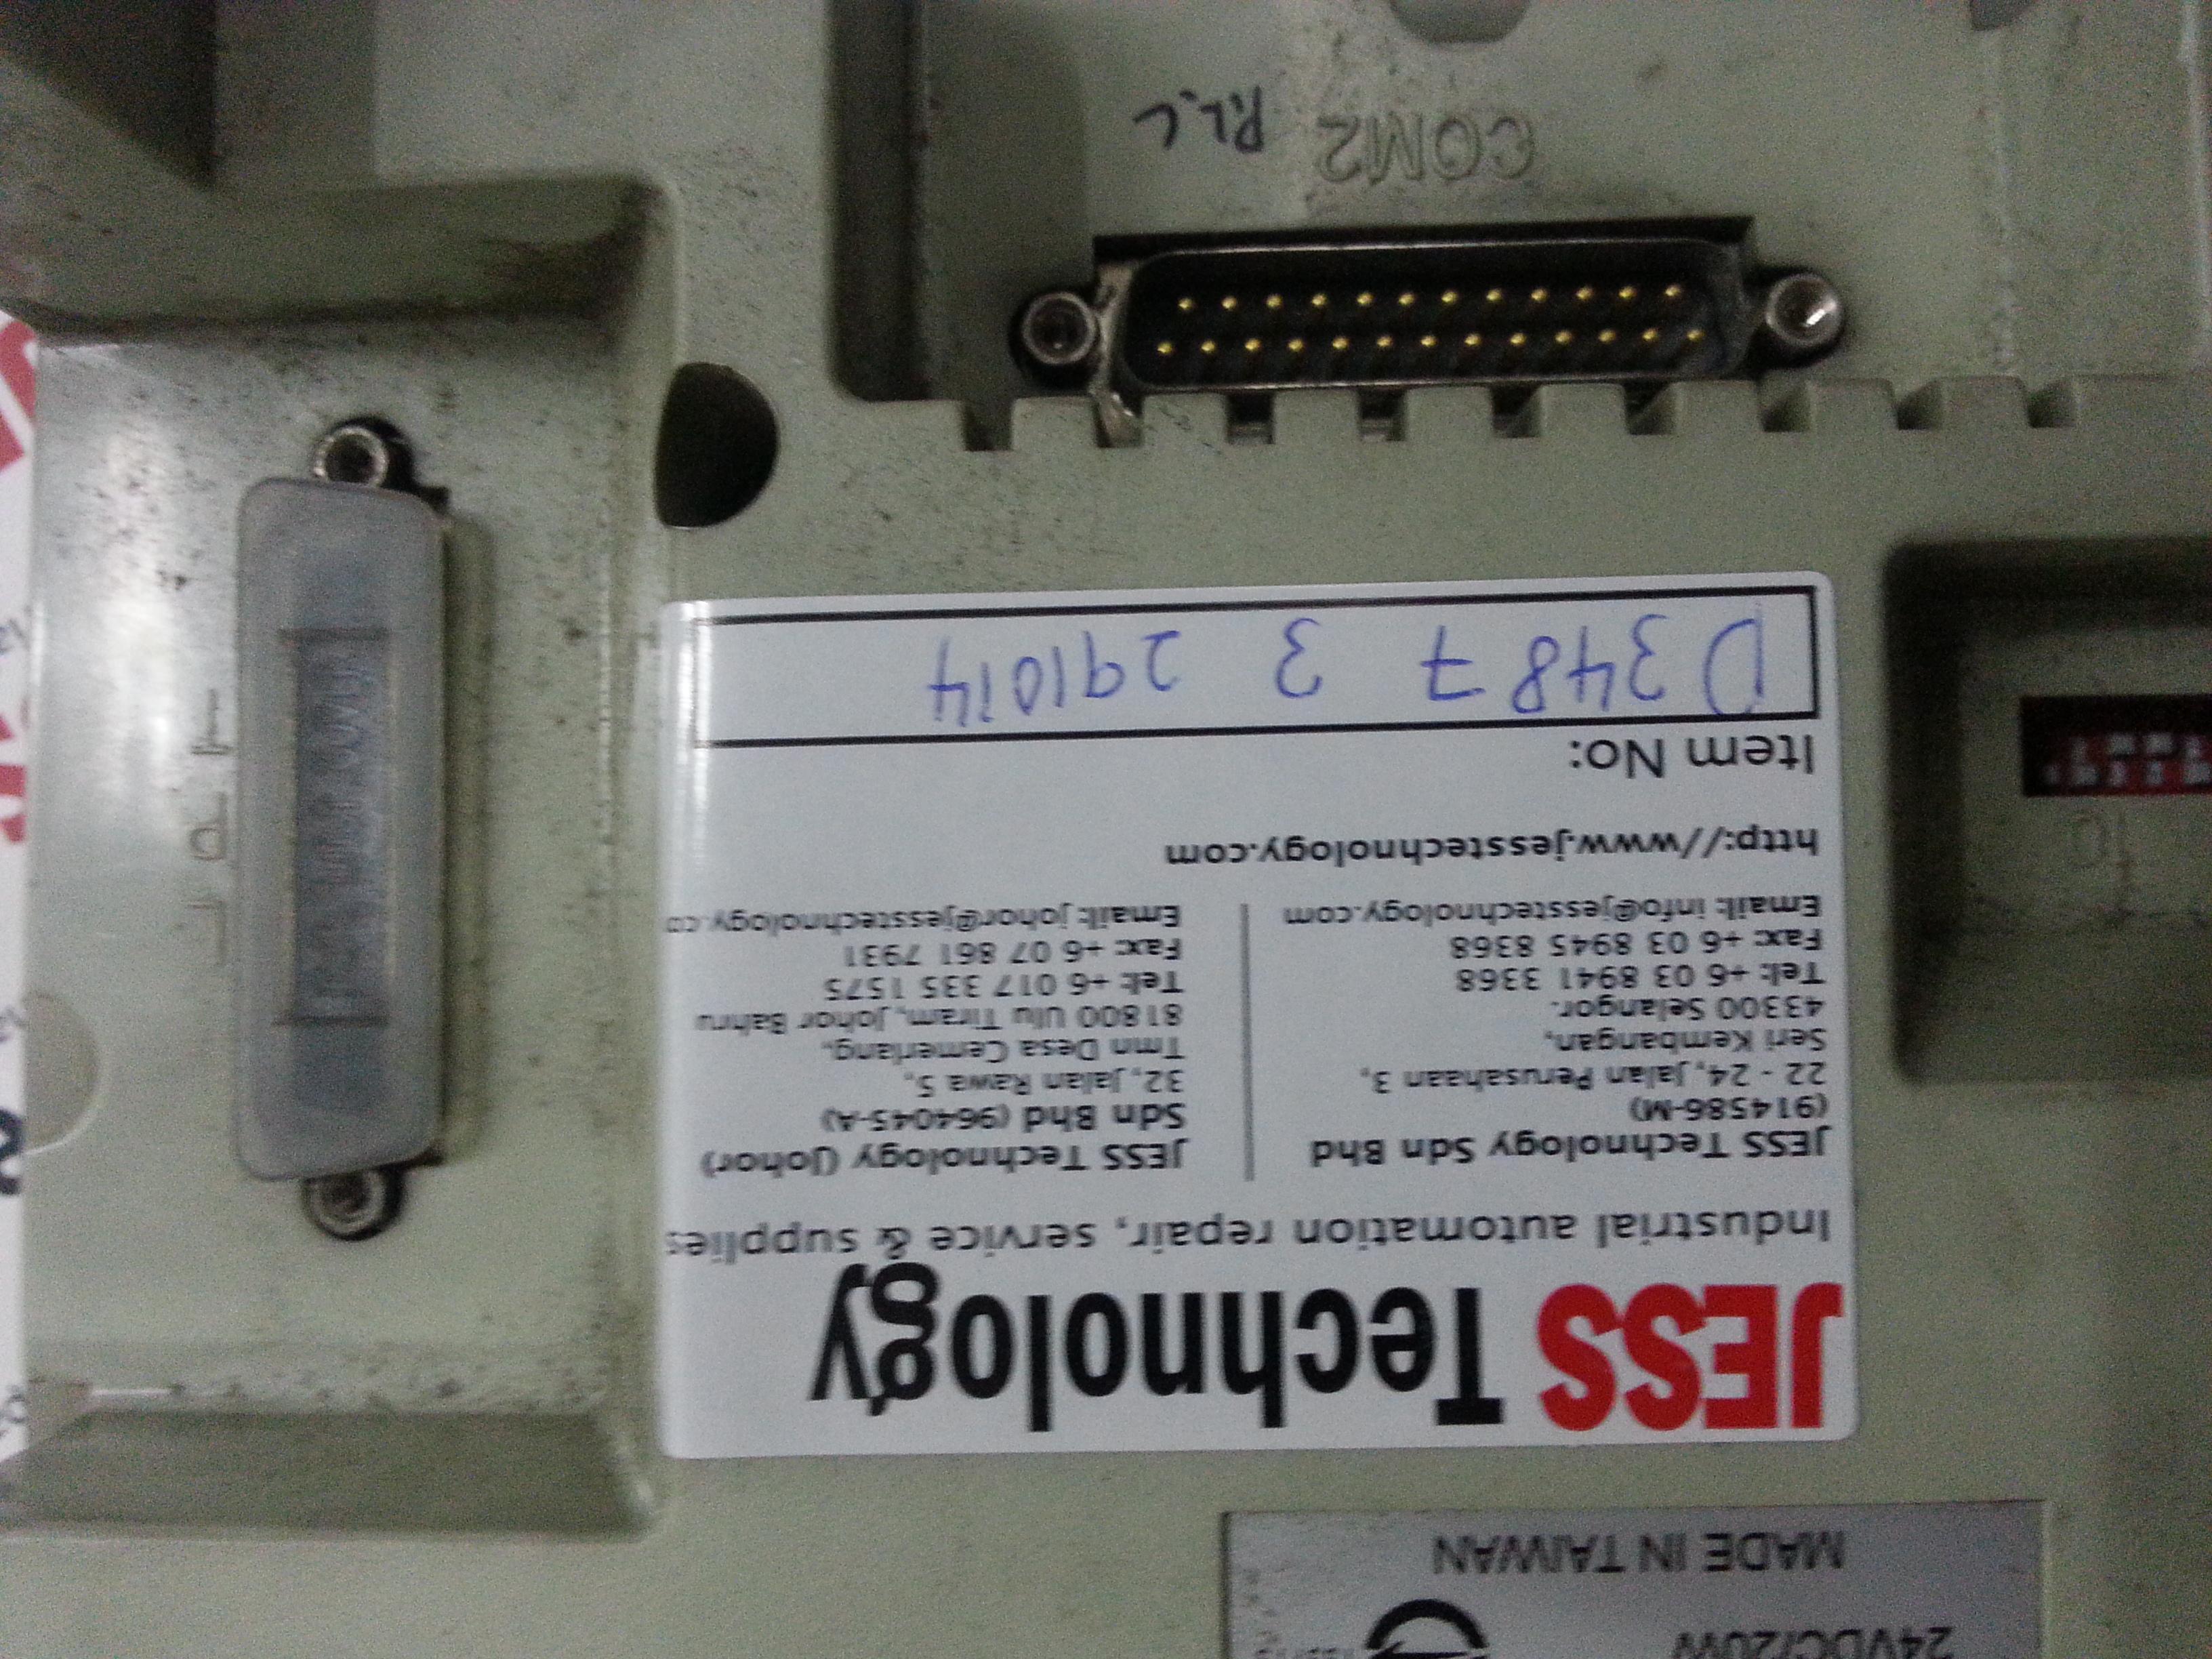 Repair PWS3261-TFT HITECH HITECH SCREEN  in Malaysia, Singapore, Thailand, Indonesia